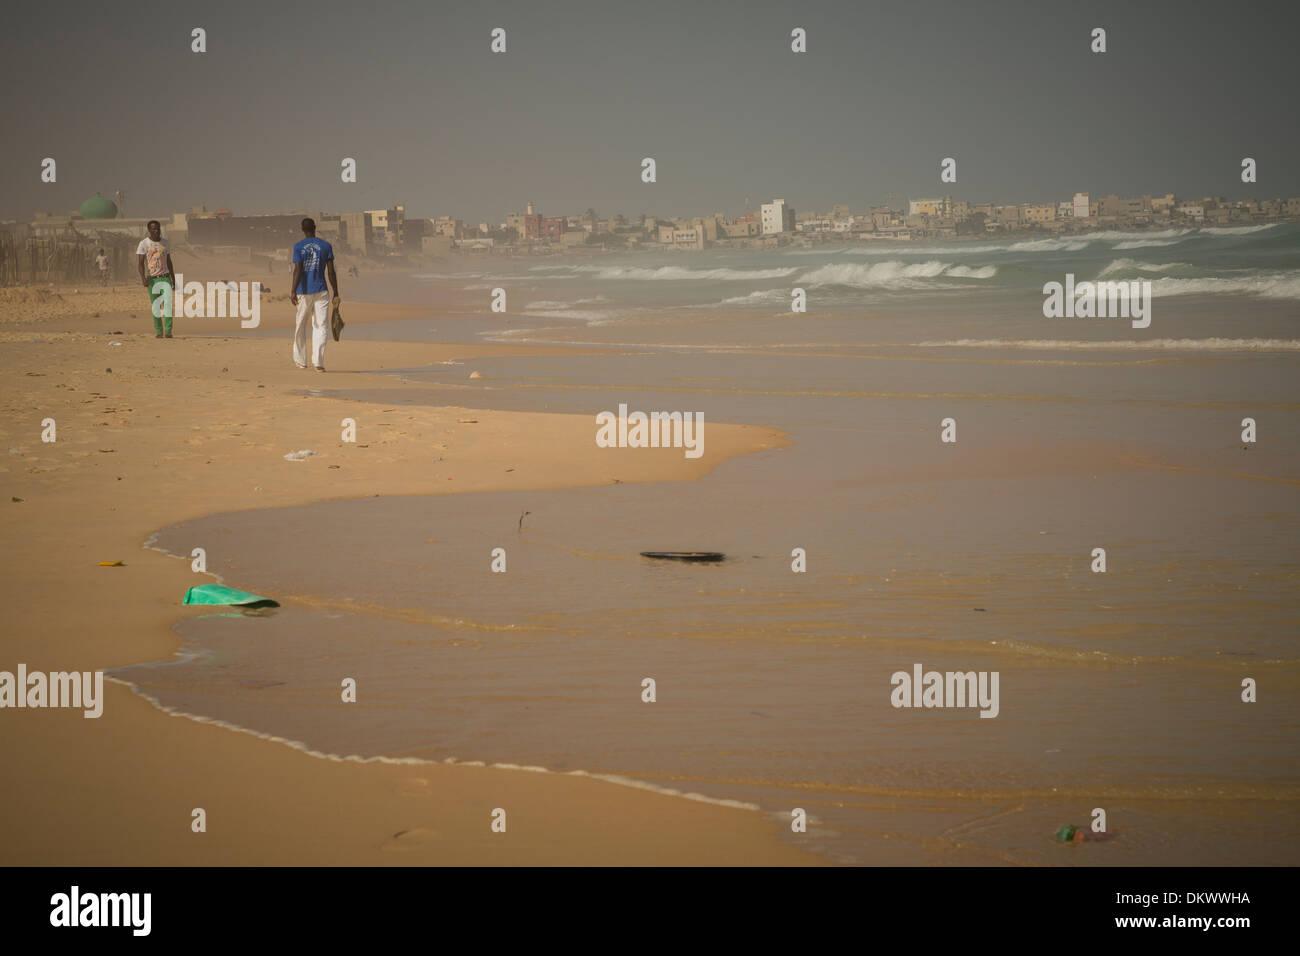 Dakar, Senegal - Stock Image